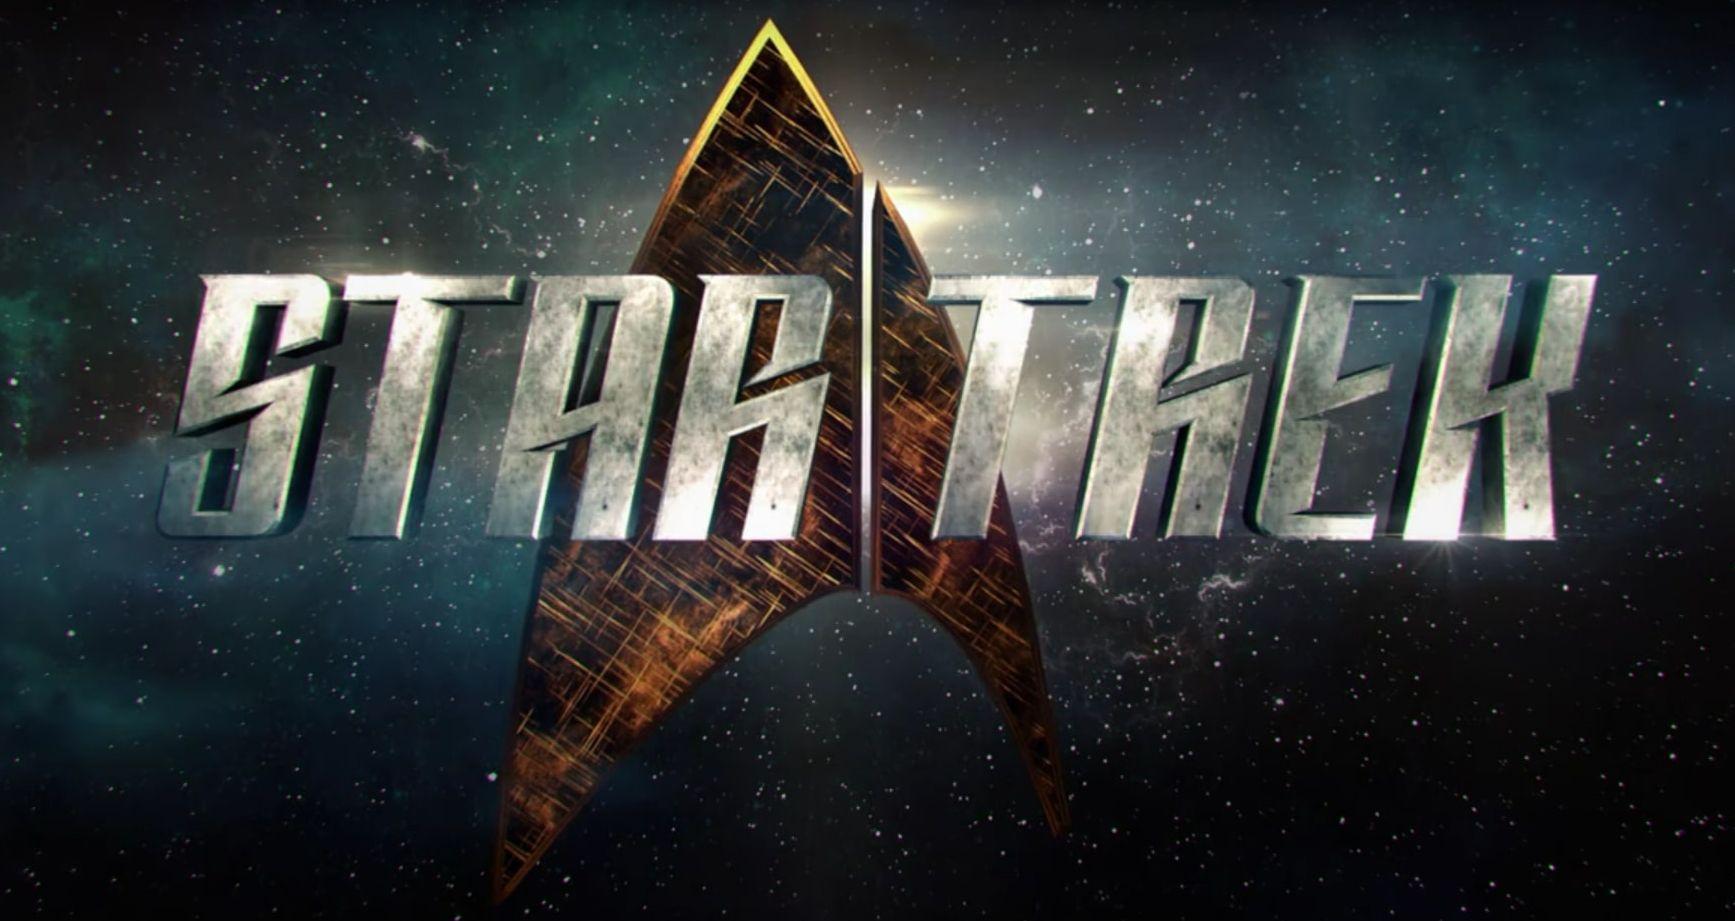 star trek series logo